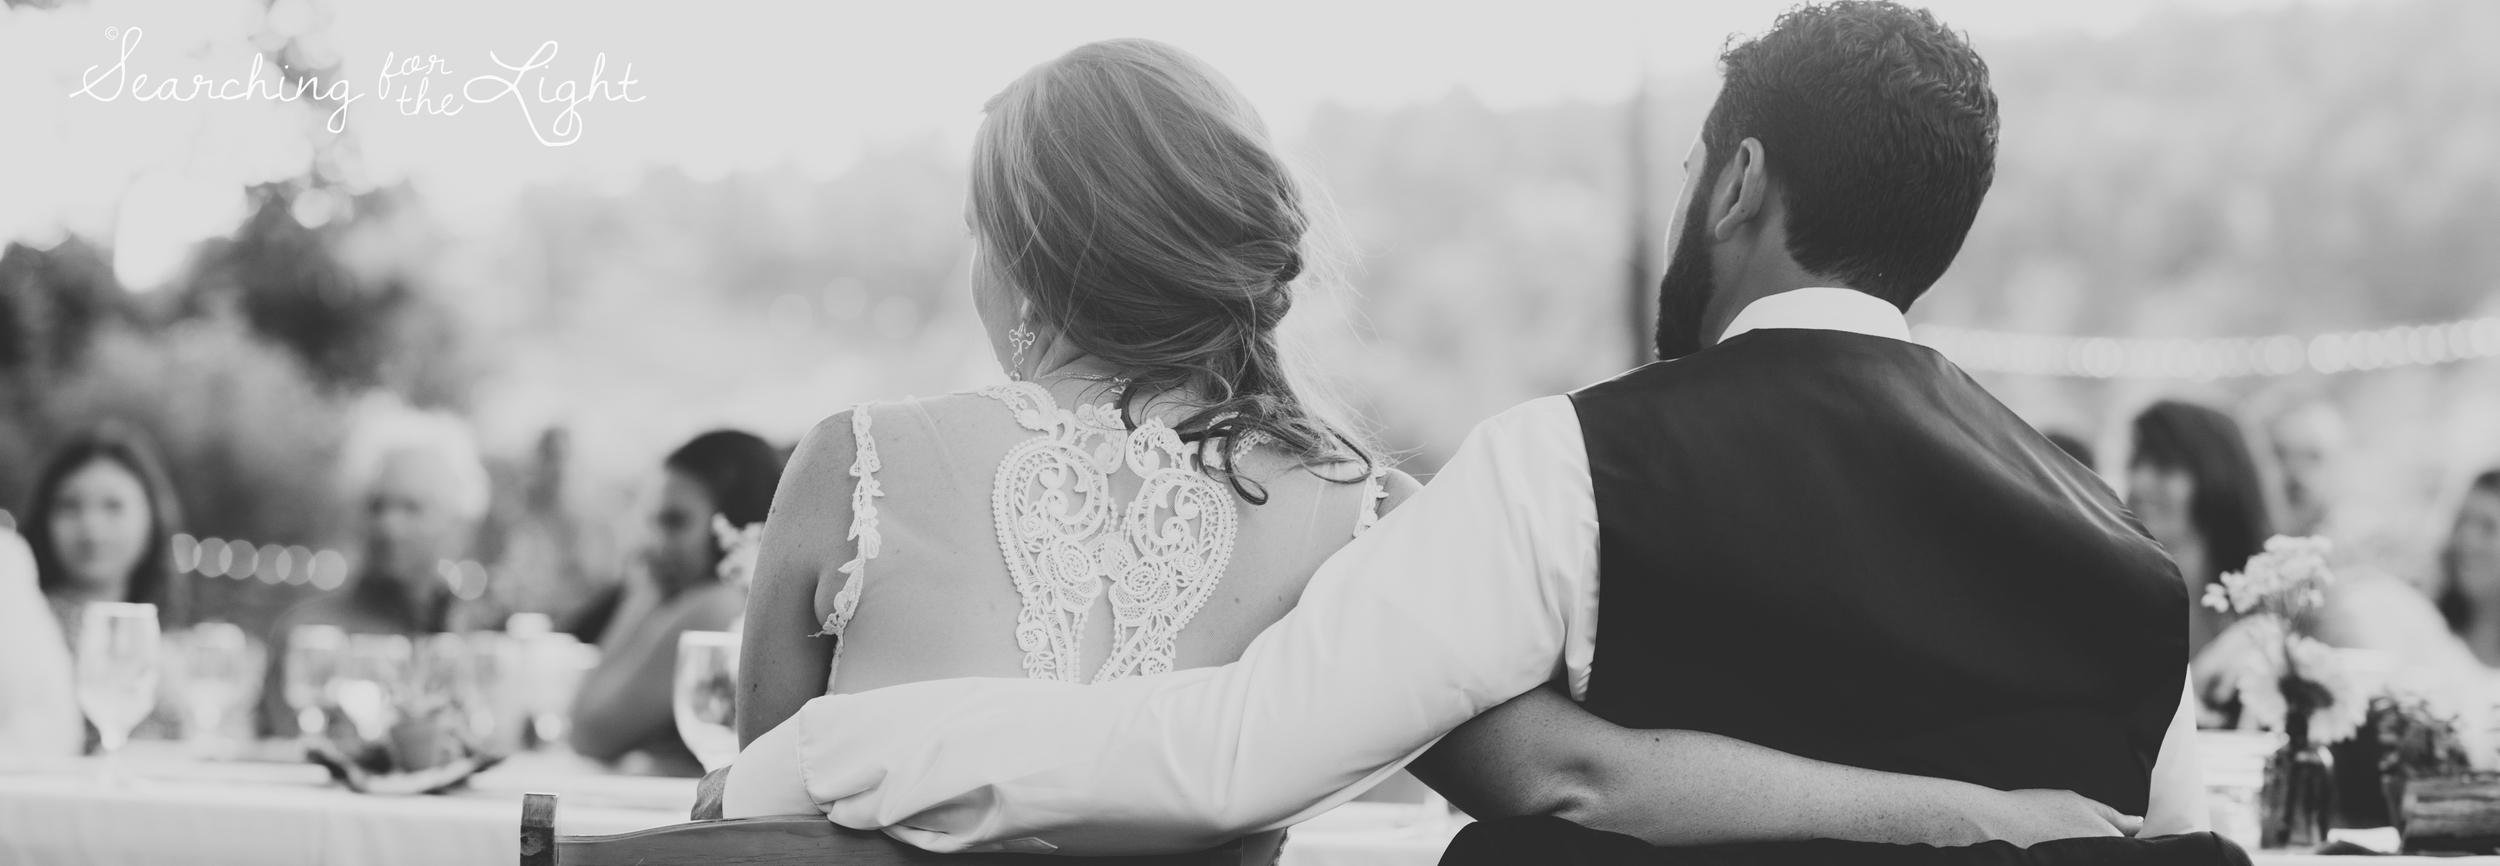 lyons farmette wedding reception photo, lyons farmette, denver wedding photographer